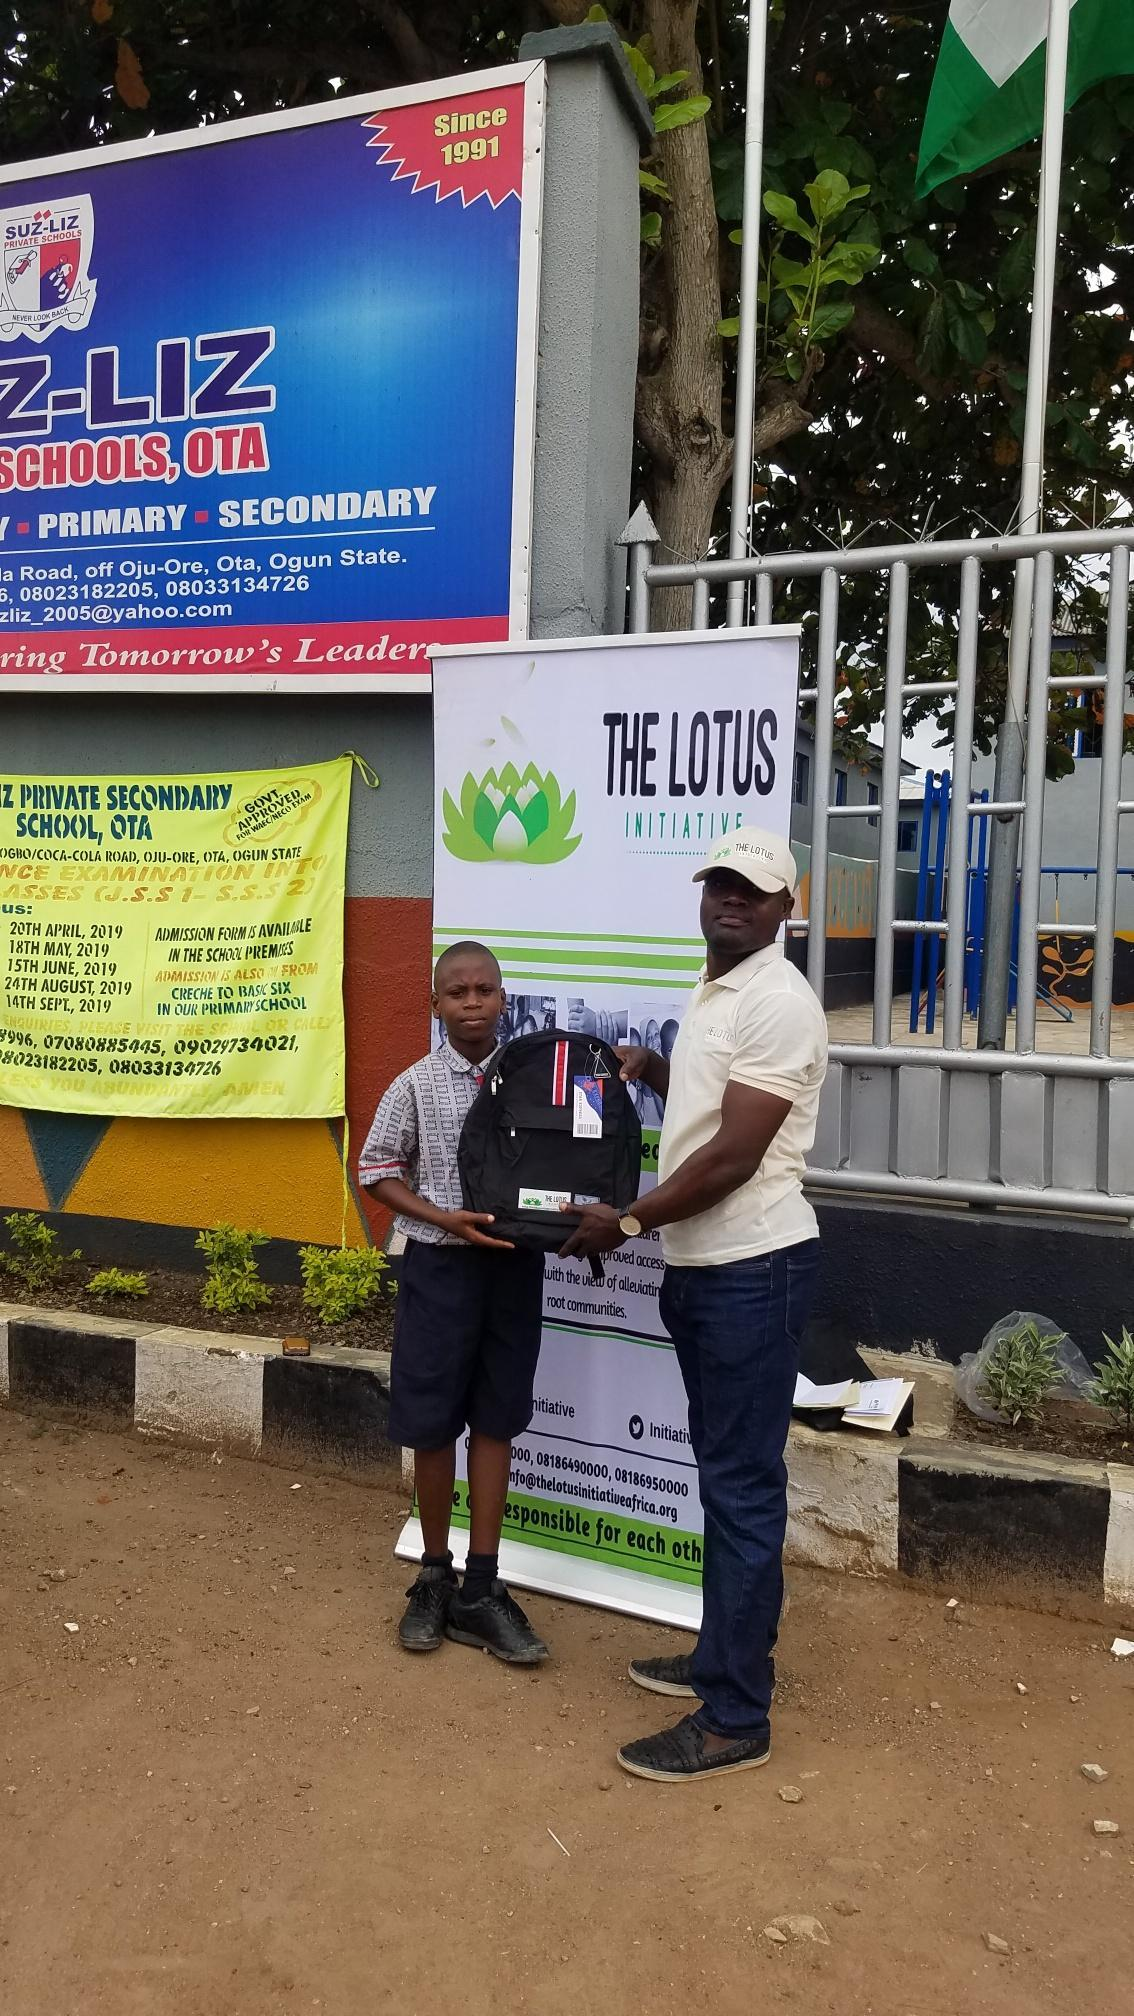 Lotus Initiative Program Manager with Lotus scholar Daniel Eyitayo of Suz-Liz Group of Schools, Otta.